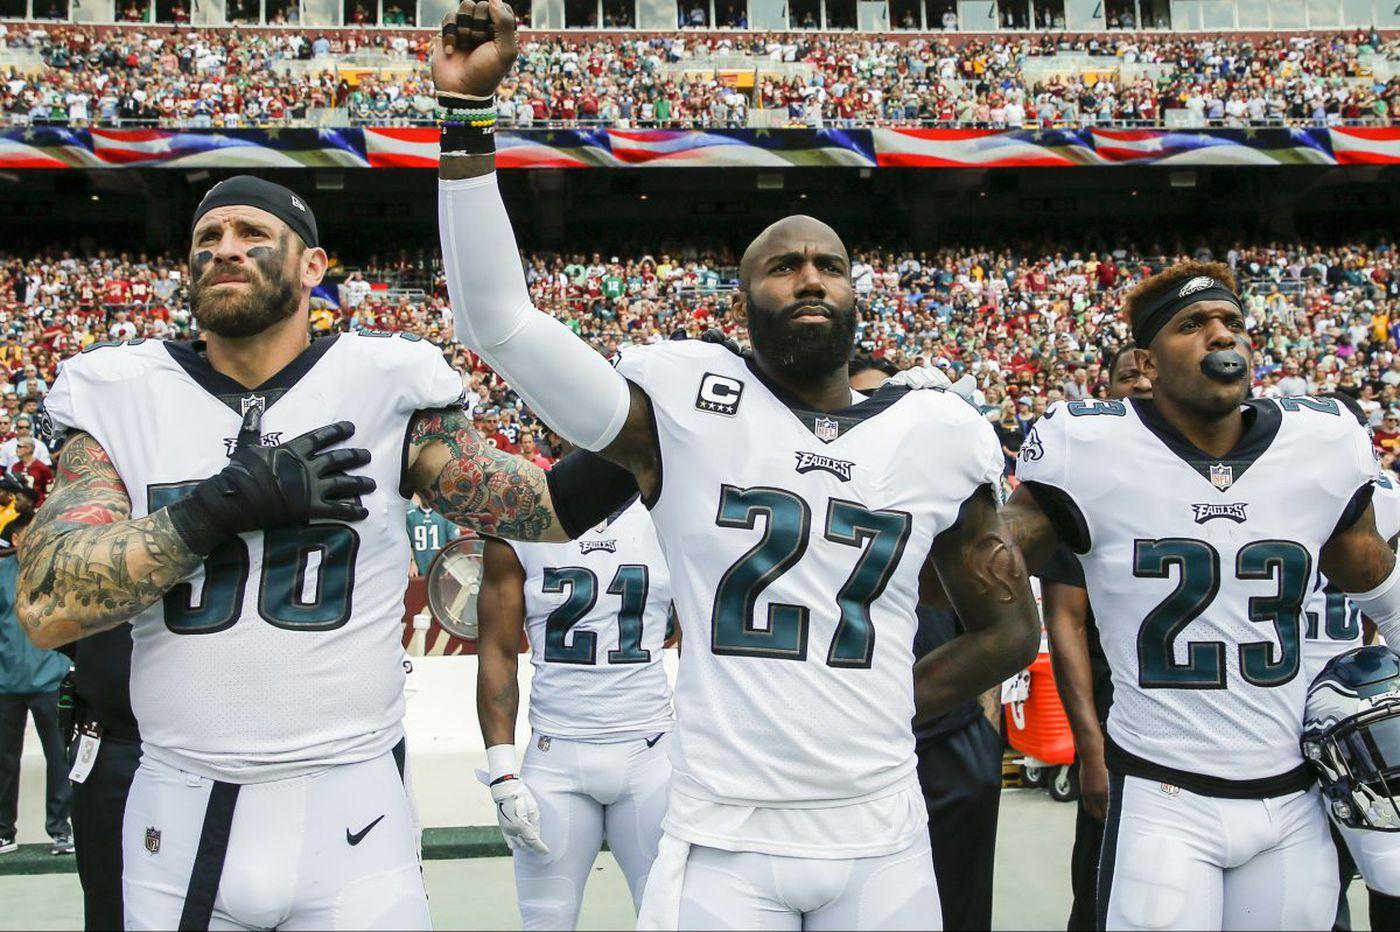 Sports media wrong to glorify athletes who snub national anthem